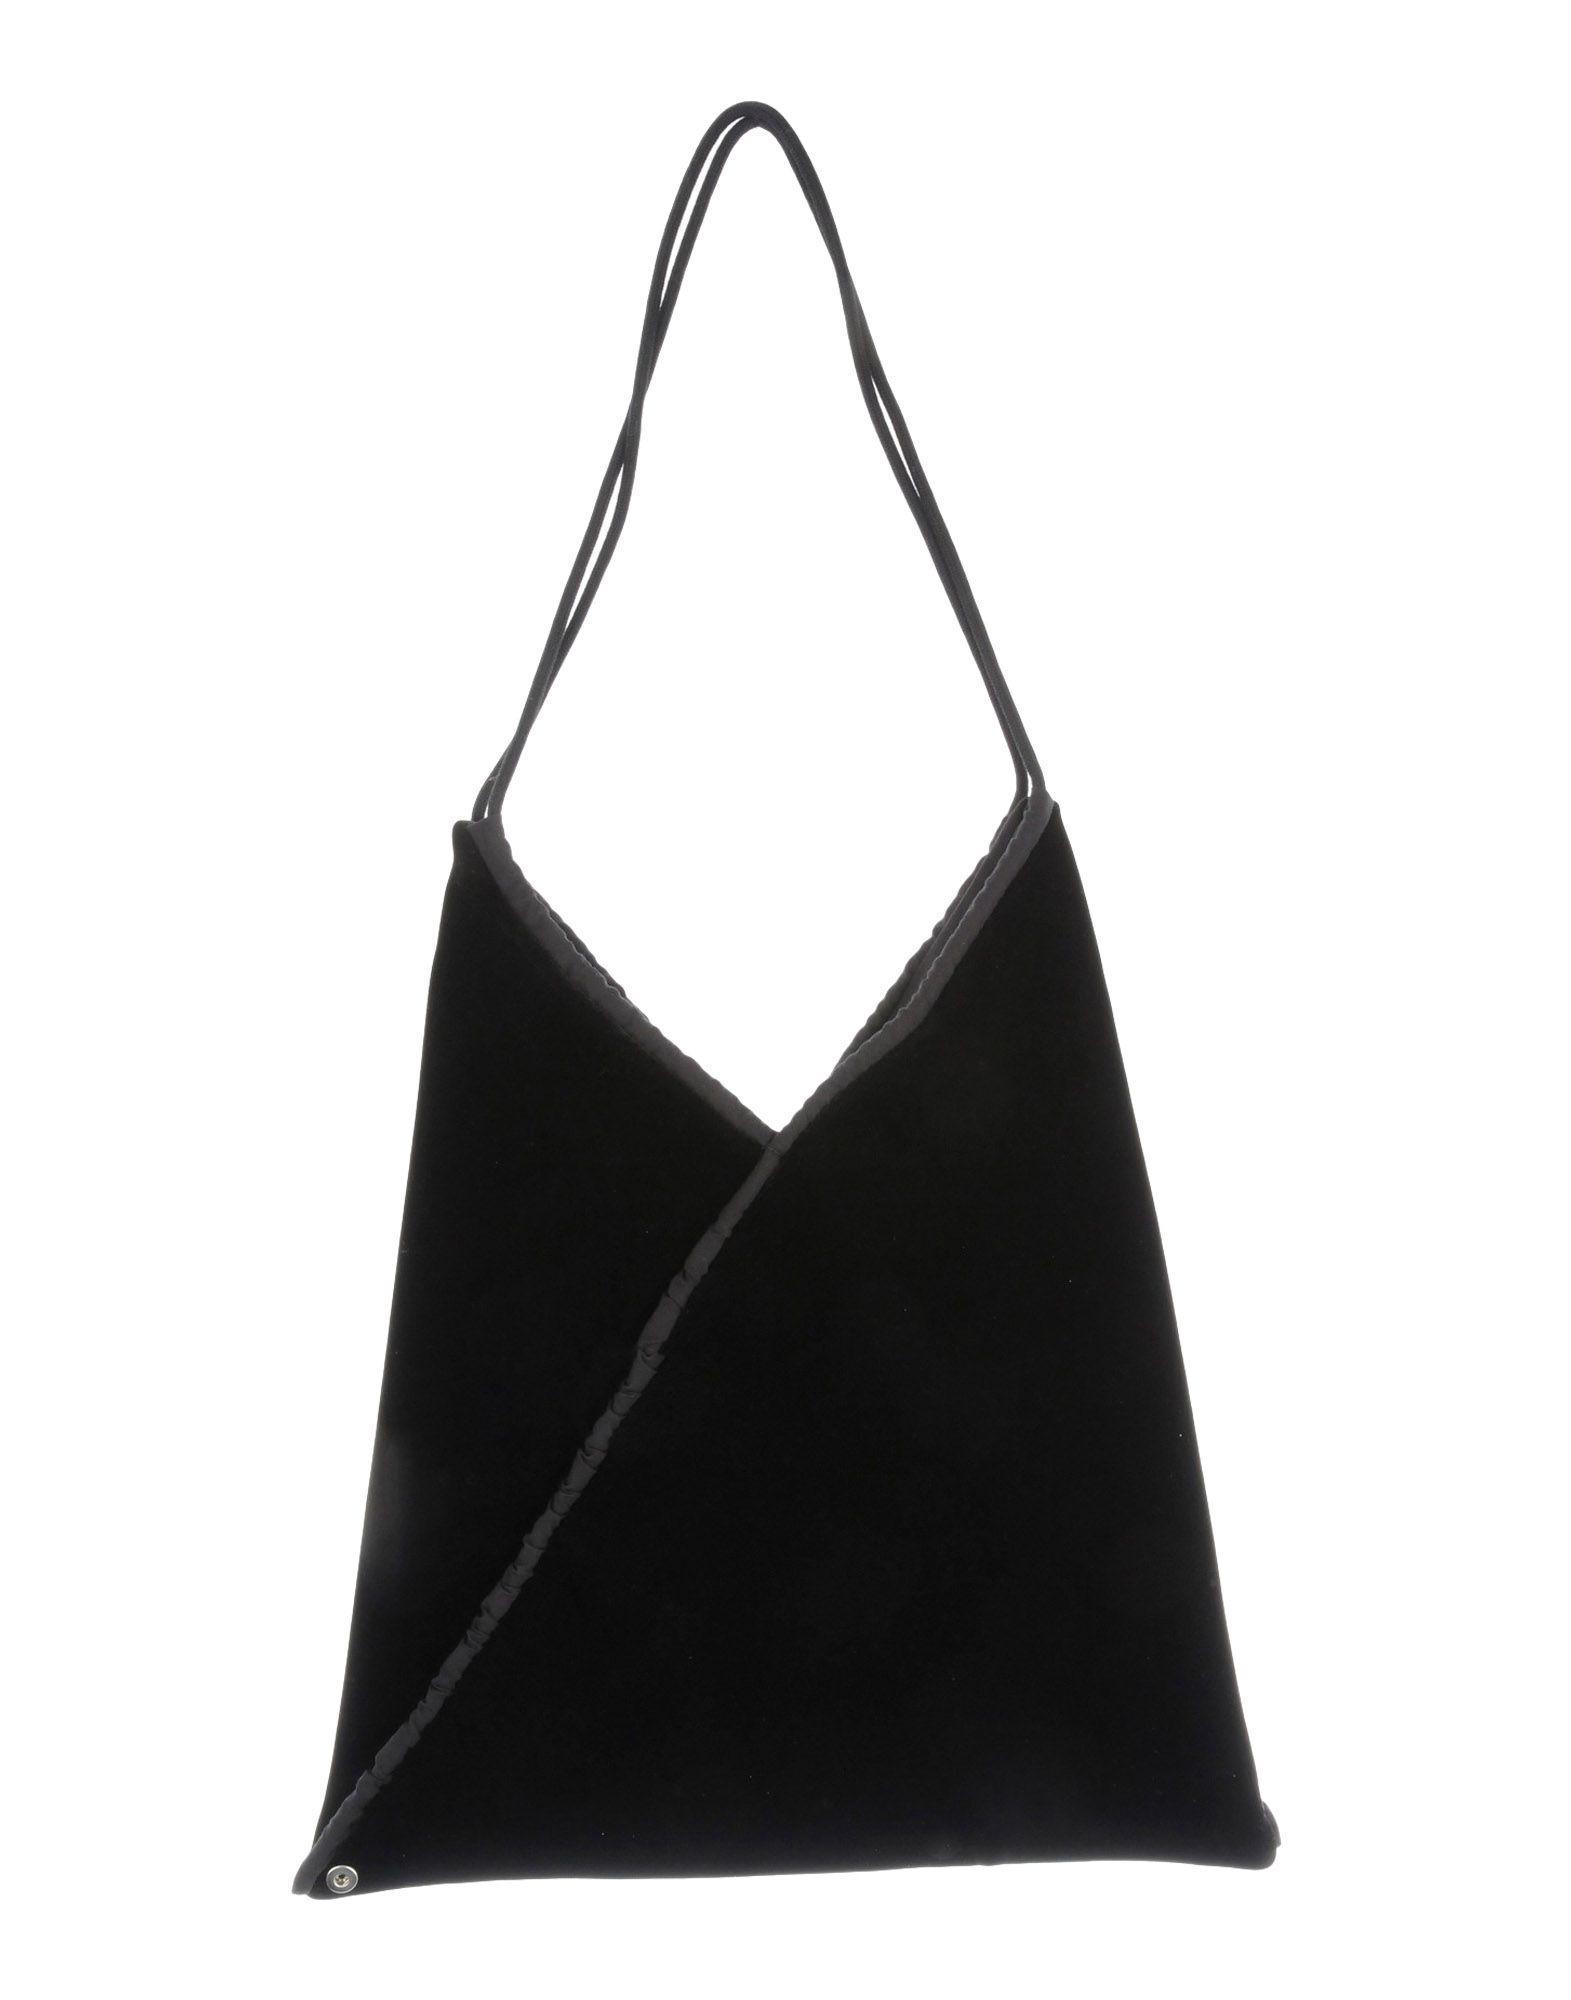 Mm6 Maison Margiela In Black